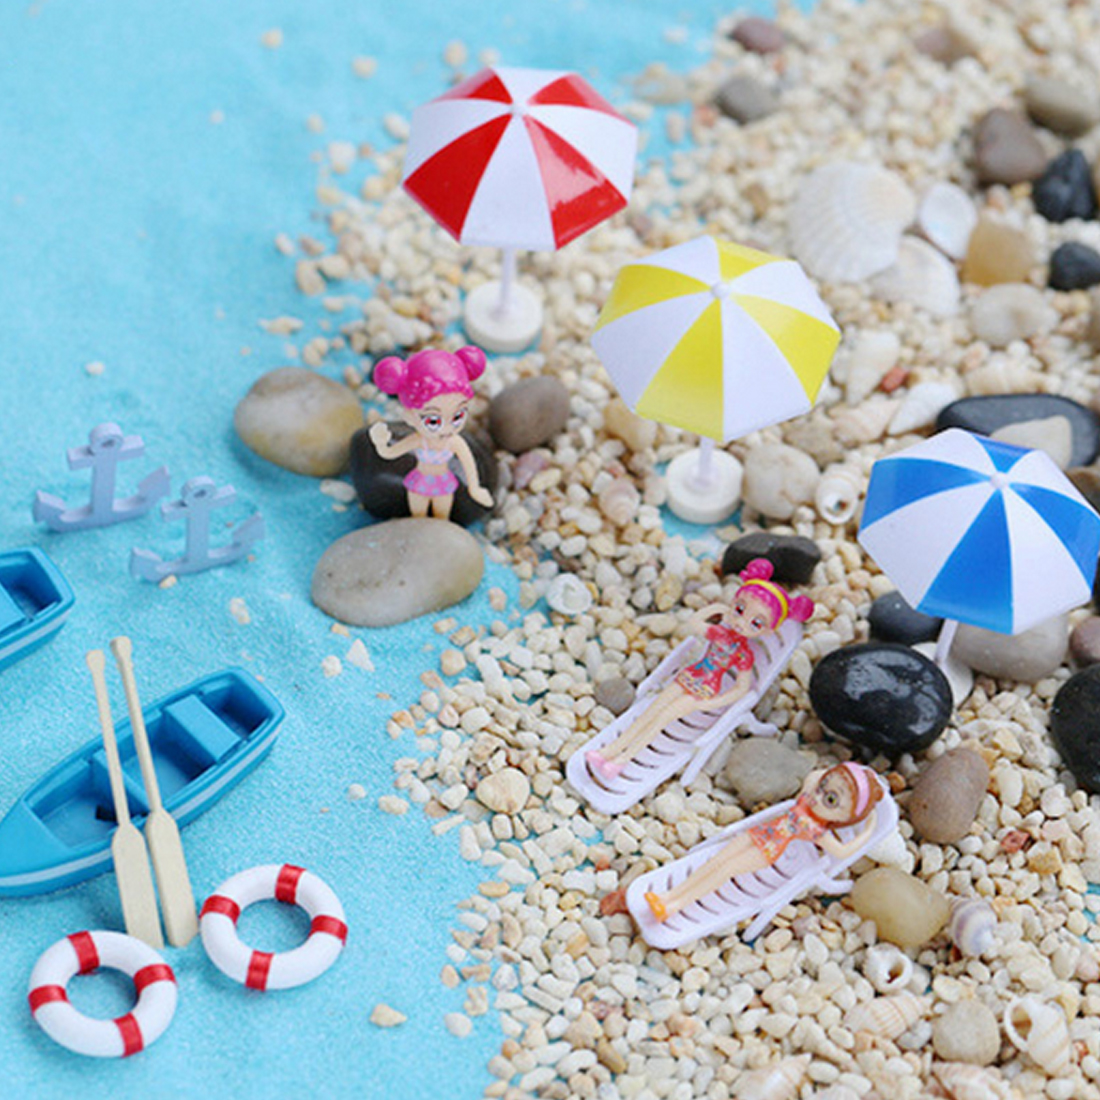 New Mini Artificial Beach Chair Micro Fairy Garden Figurine Miniature/Terrarium/Doll House Decoration Ornament DIY Accessories